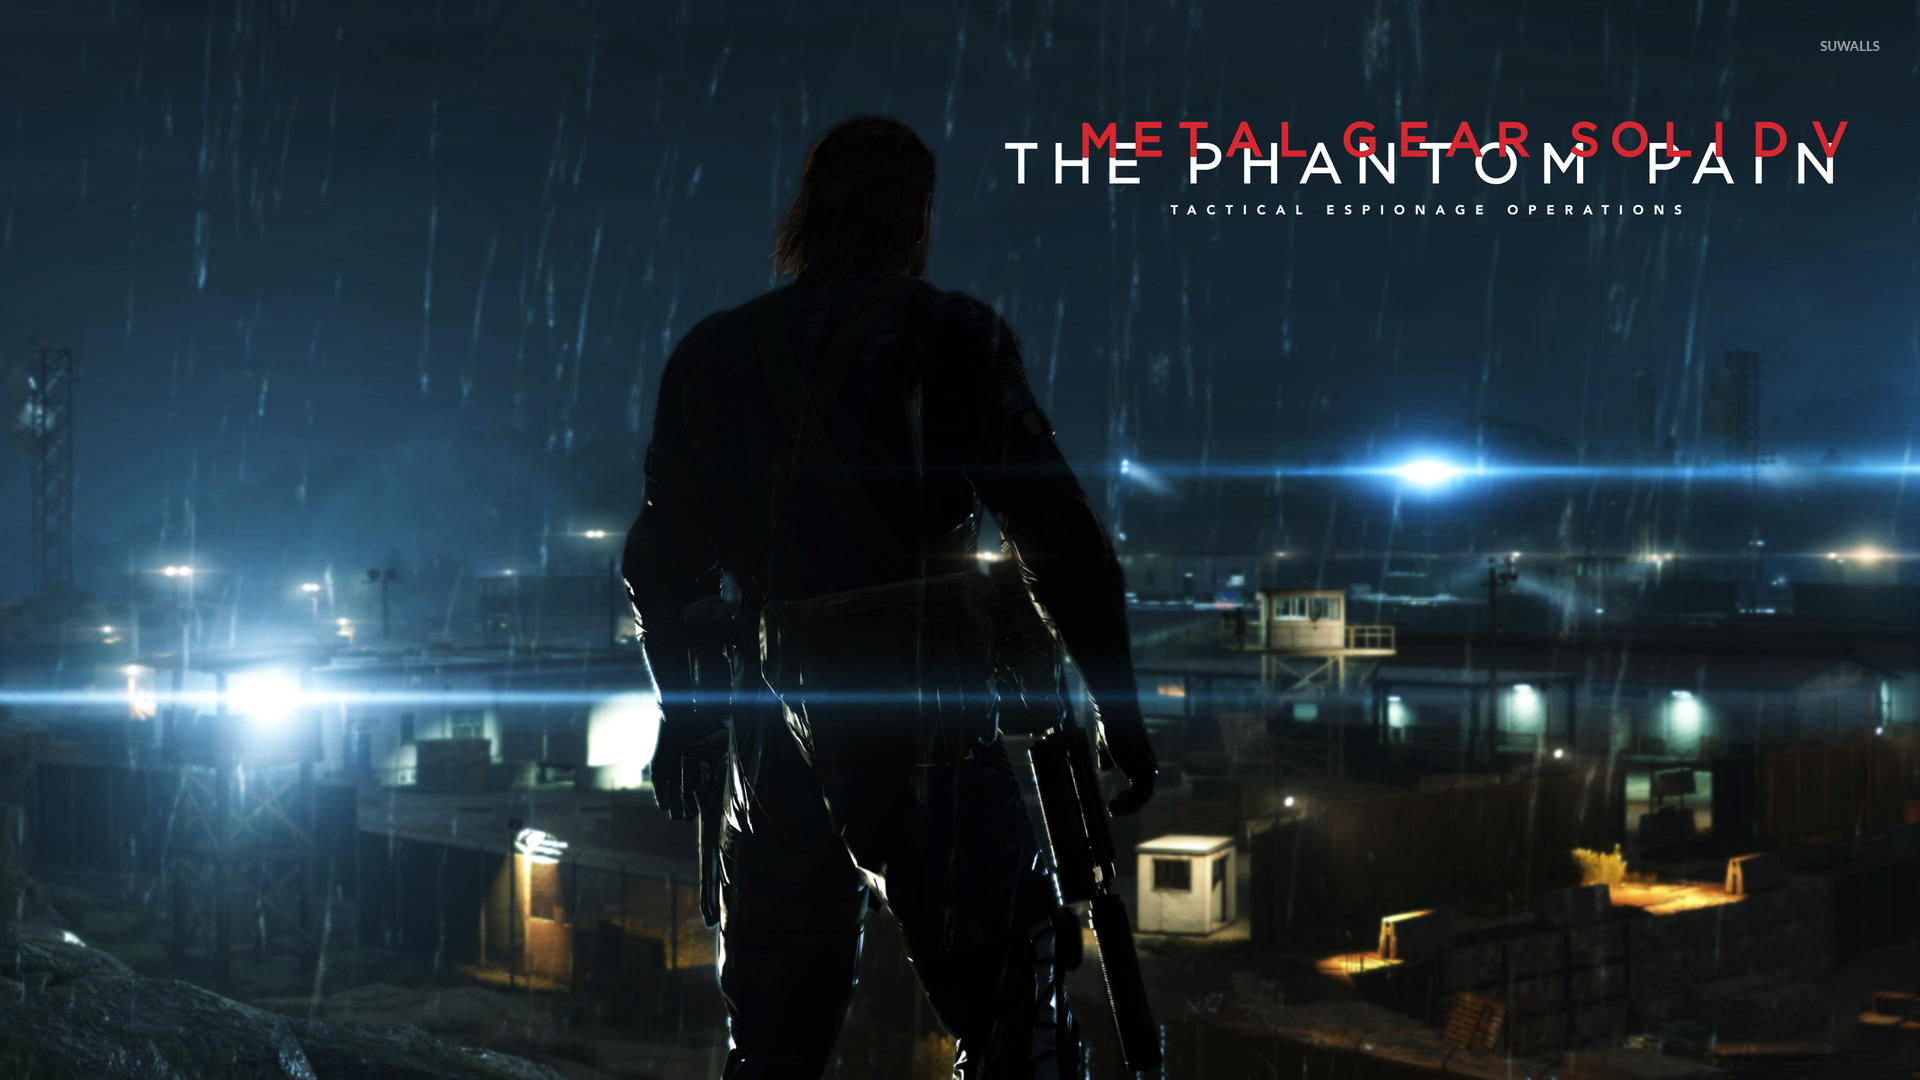 Metal Gear Solid Ground Zeroes Video Game 4k Hd Desktop: Big Boss Phantom Pain Wallpaper